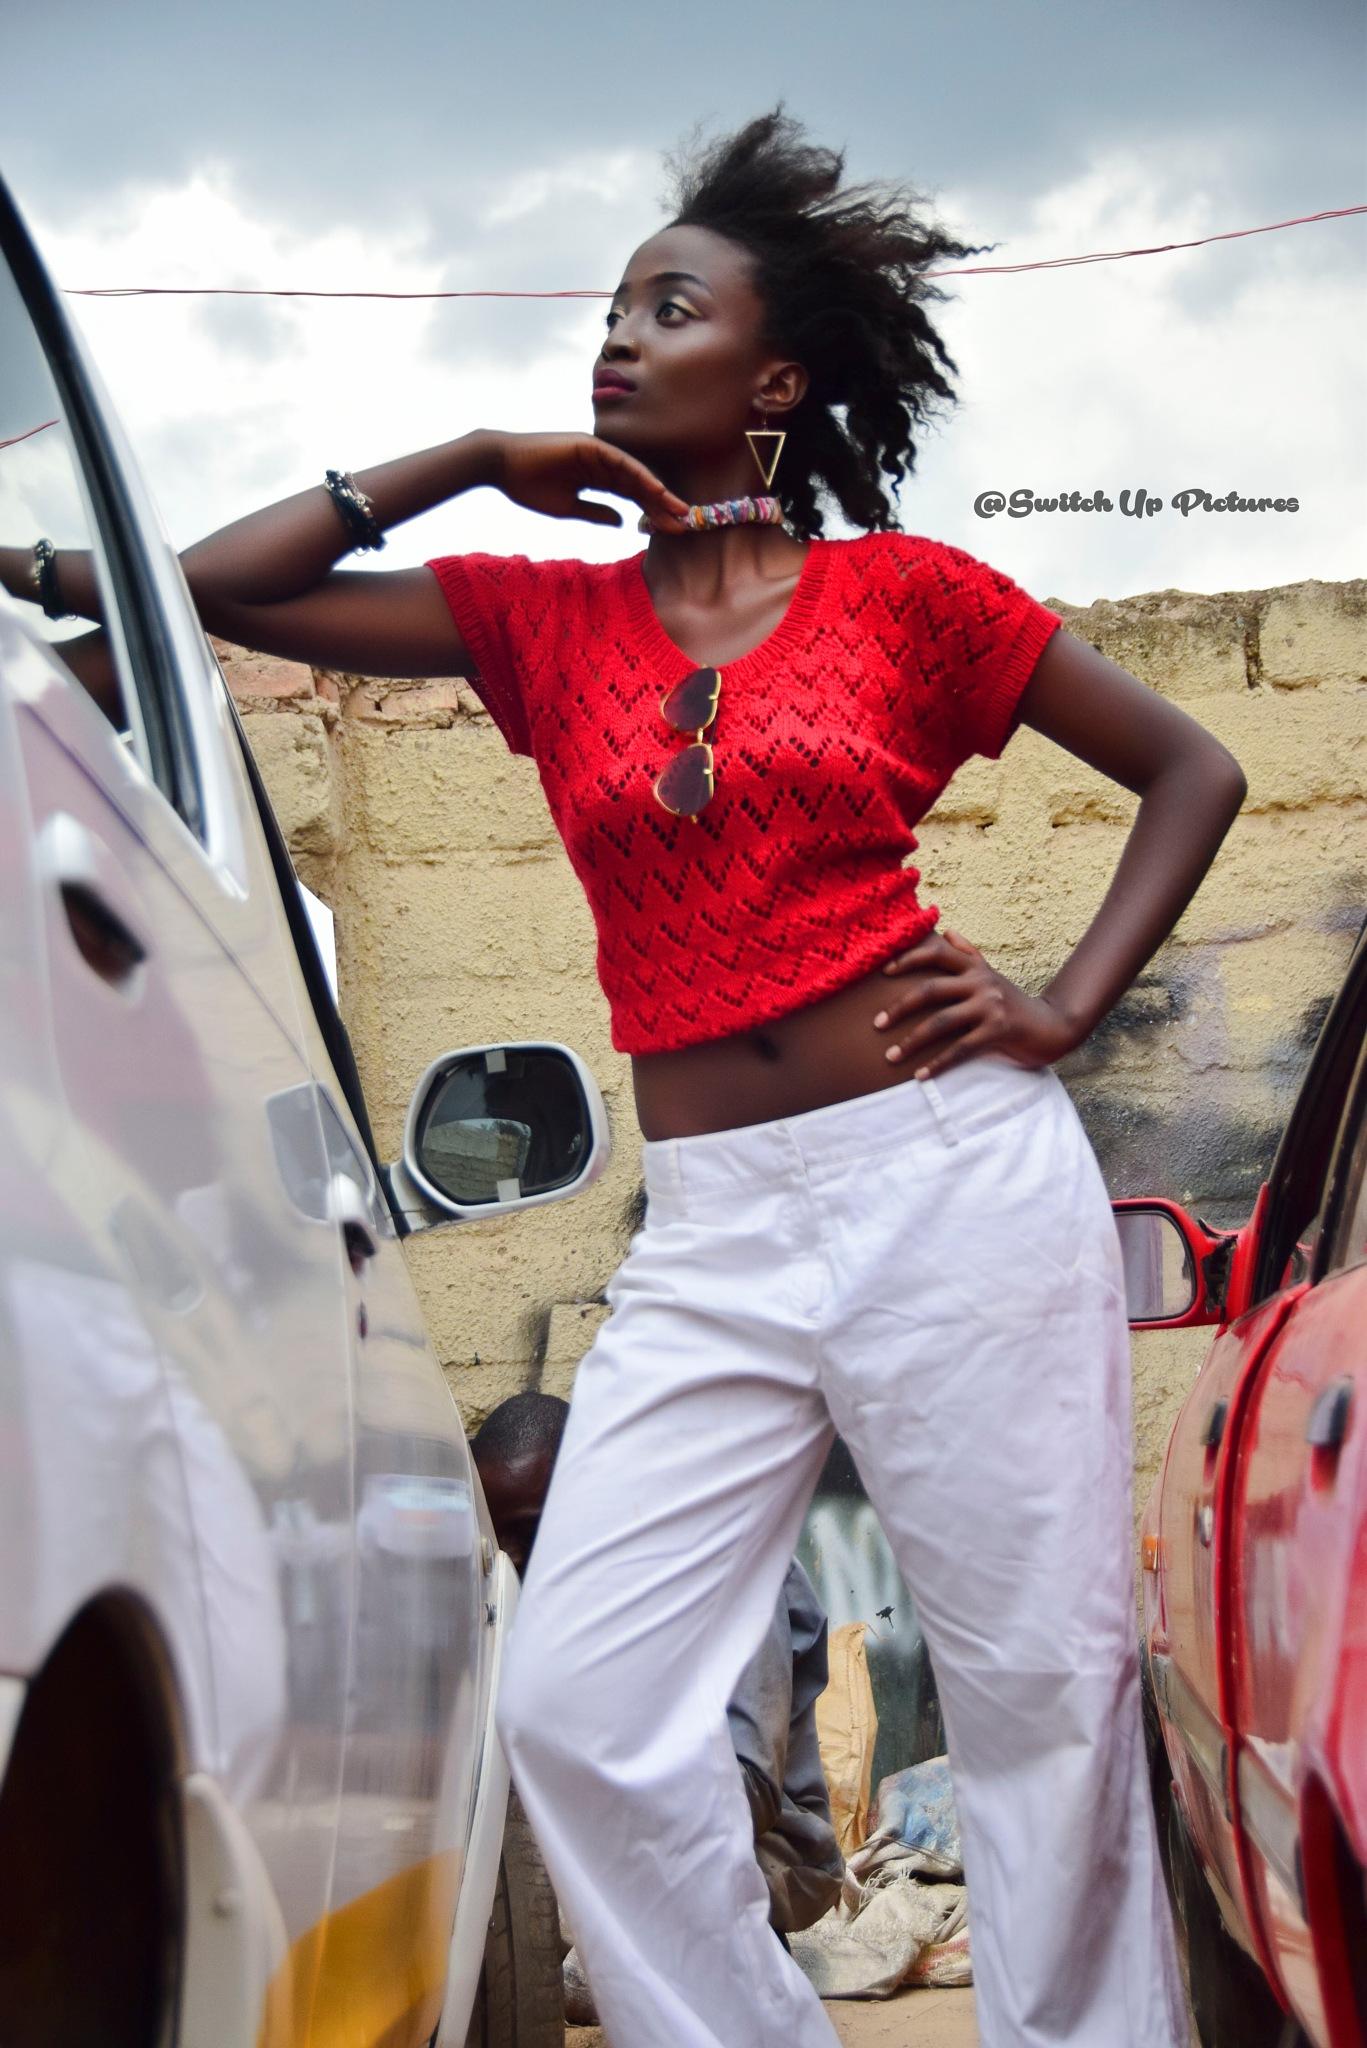 Fashion Photography by Yassyn Brown